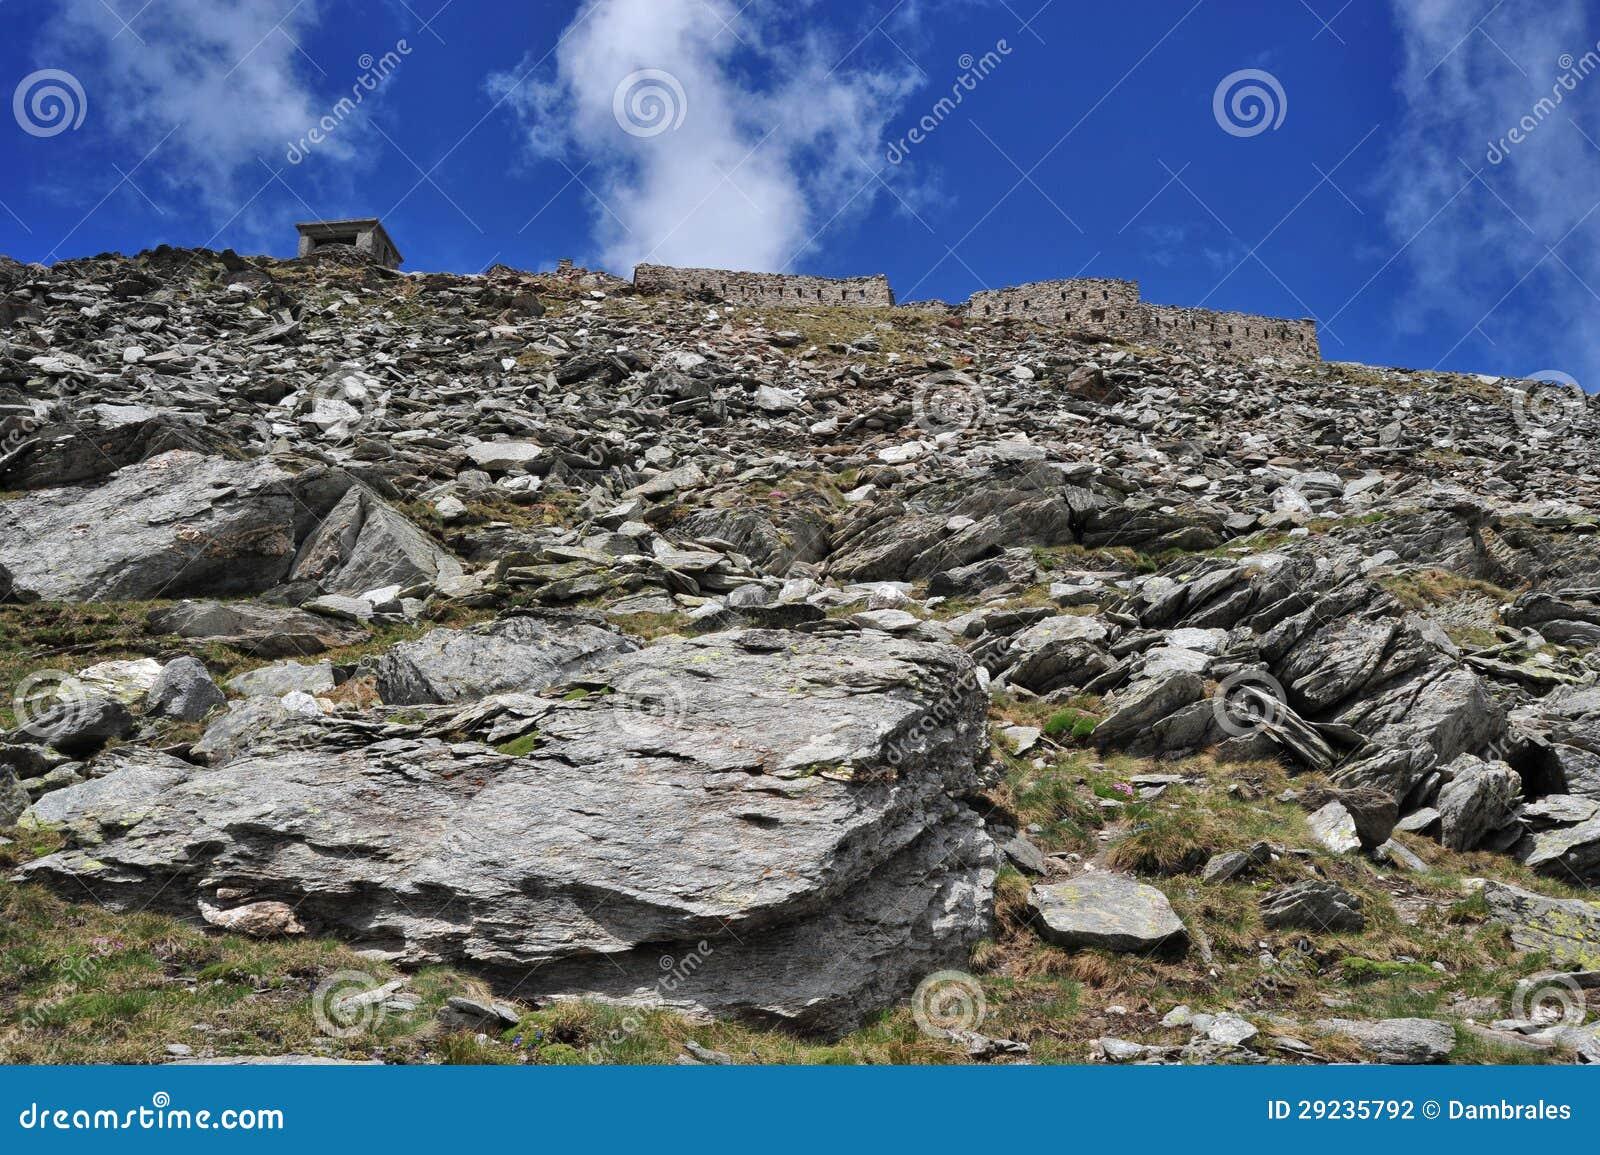 Download Forte Malamot foto de stock. Imagem de hiking, lago, concreto - 29235792